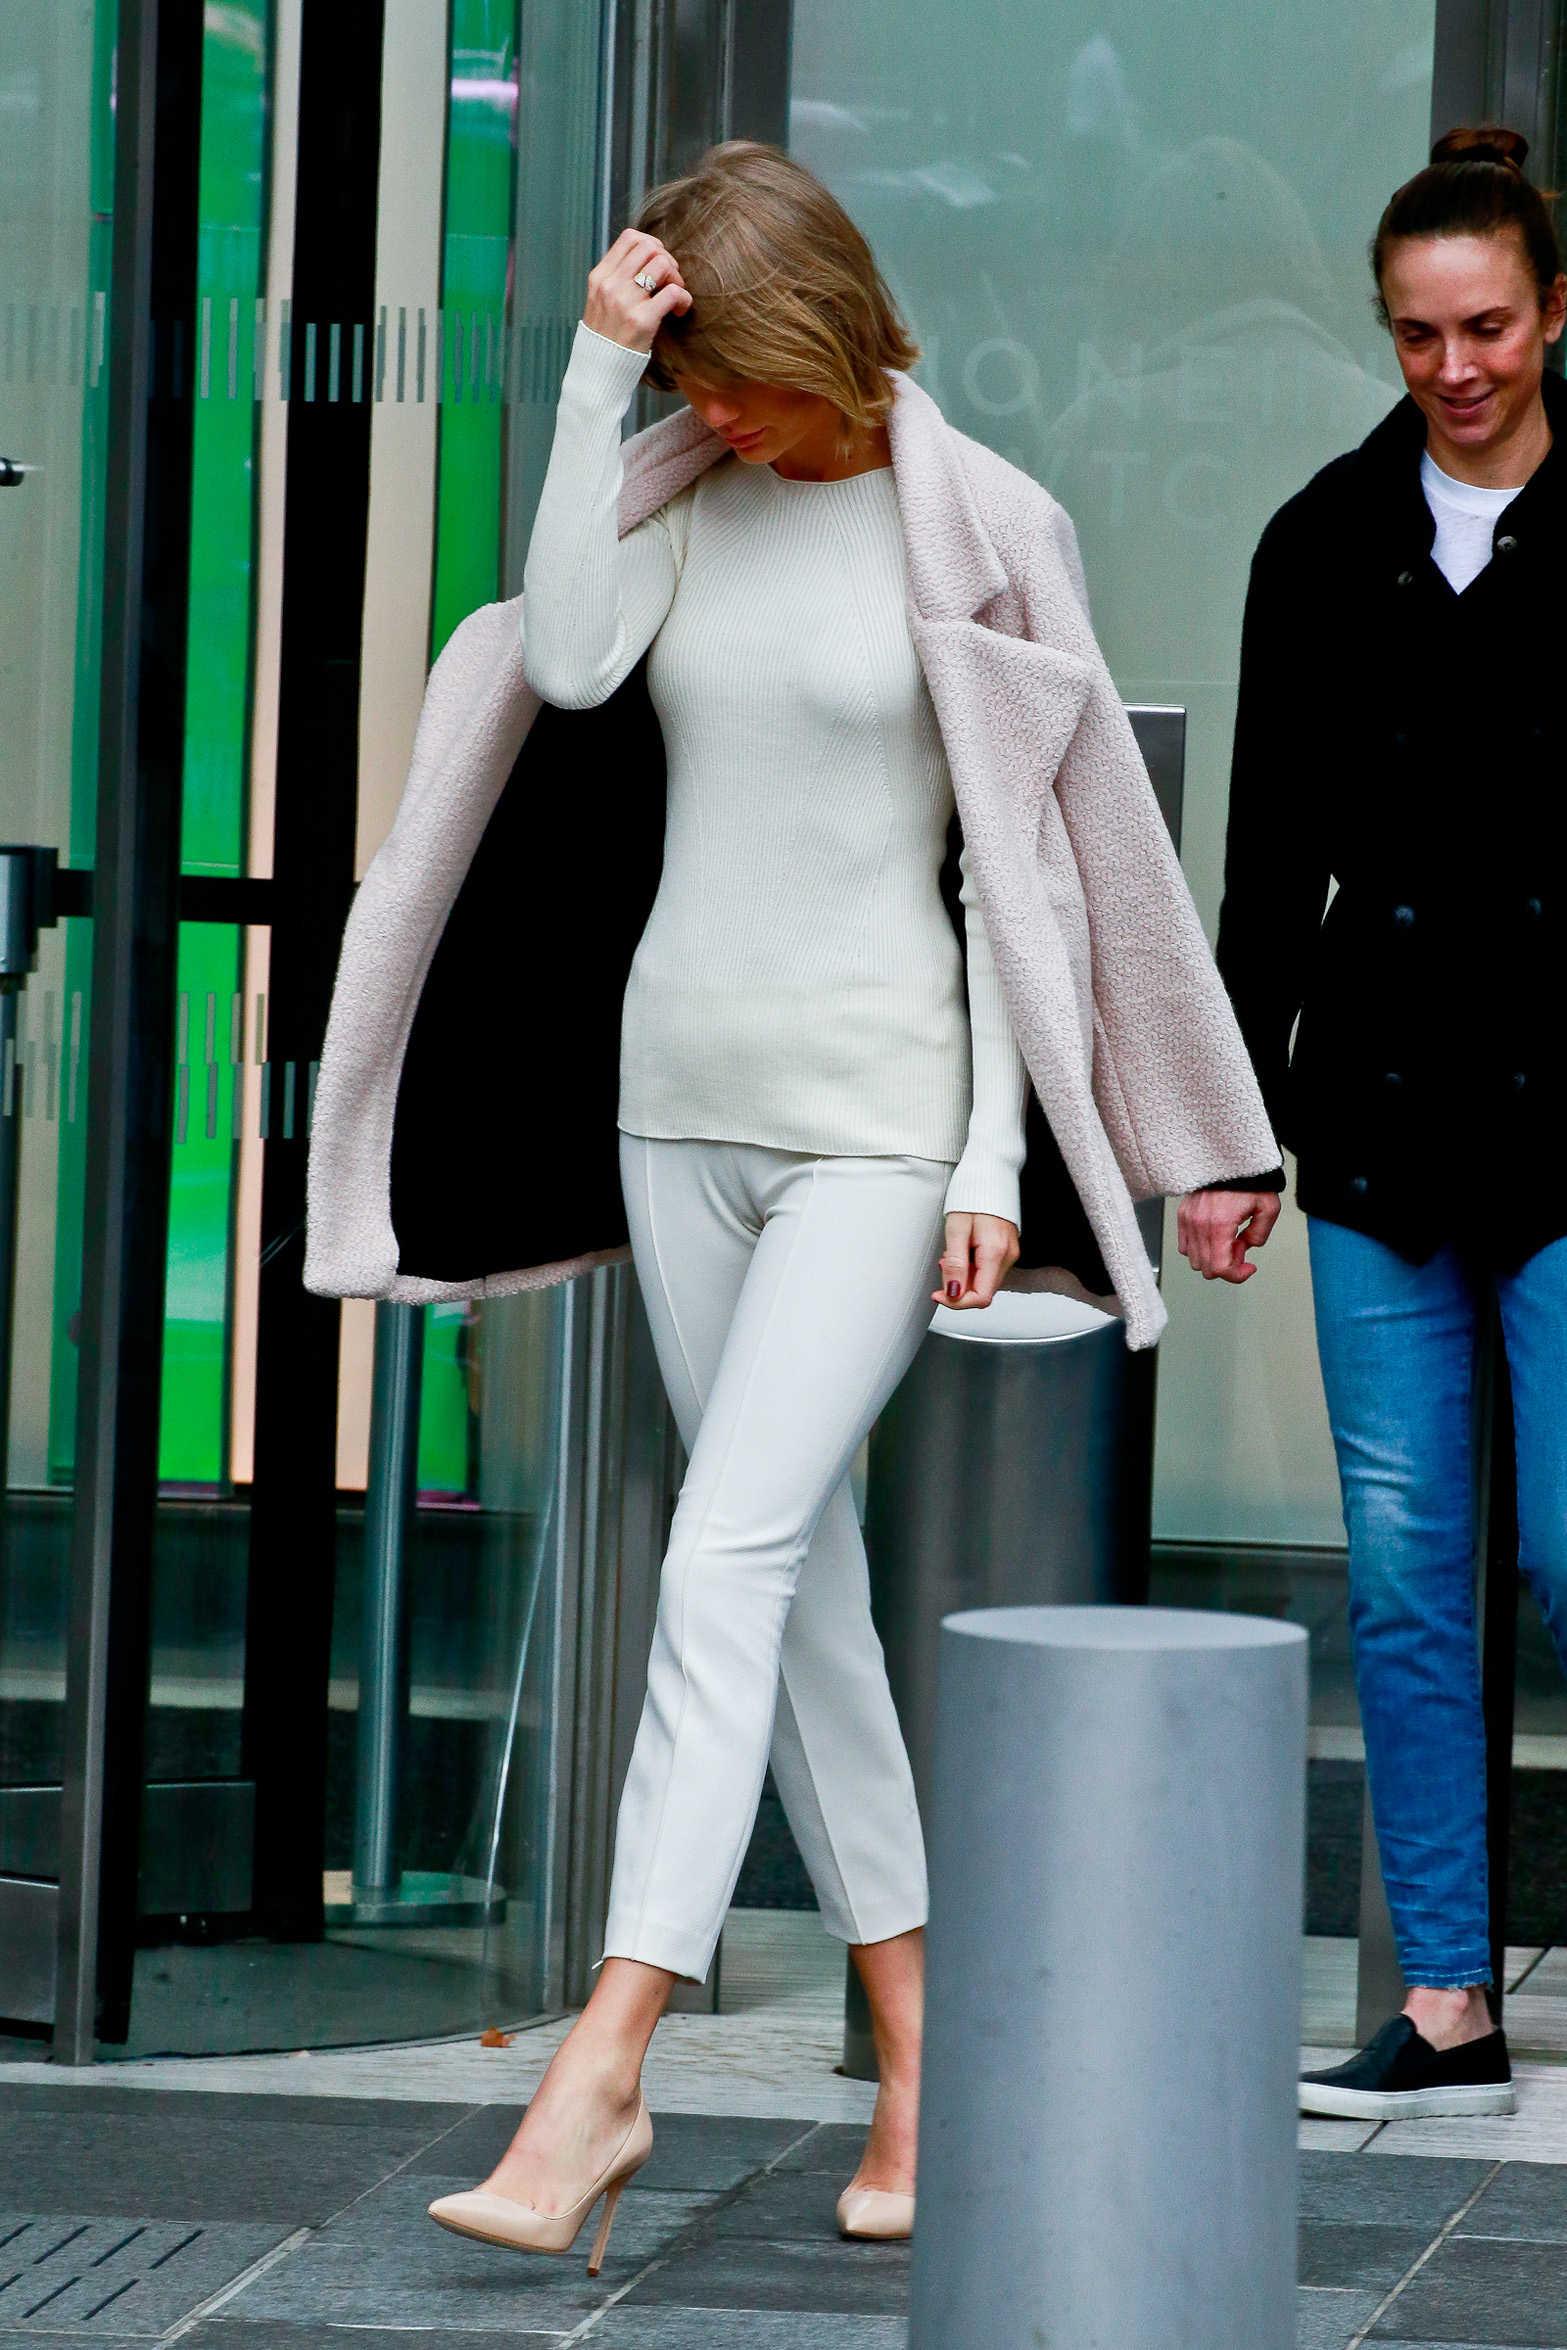 Taylor Swift - Huge Cameltoe (6 photos) ⋆ Pandesia World